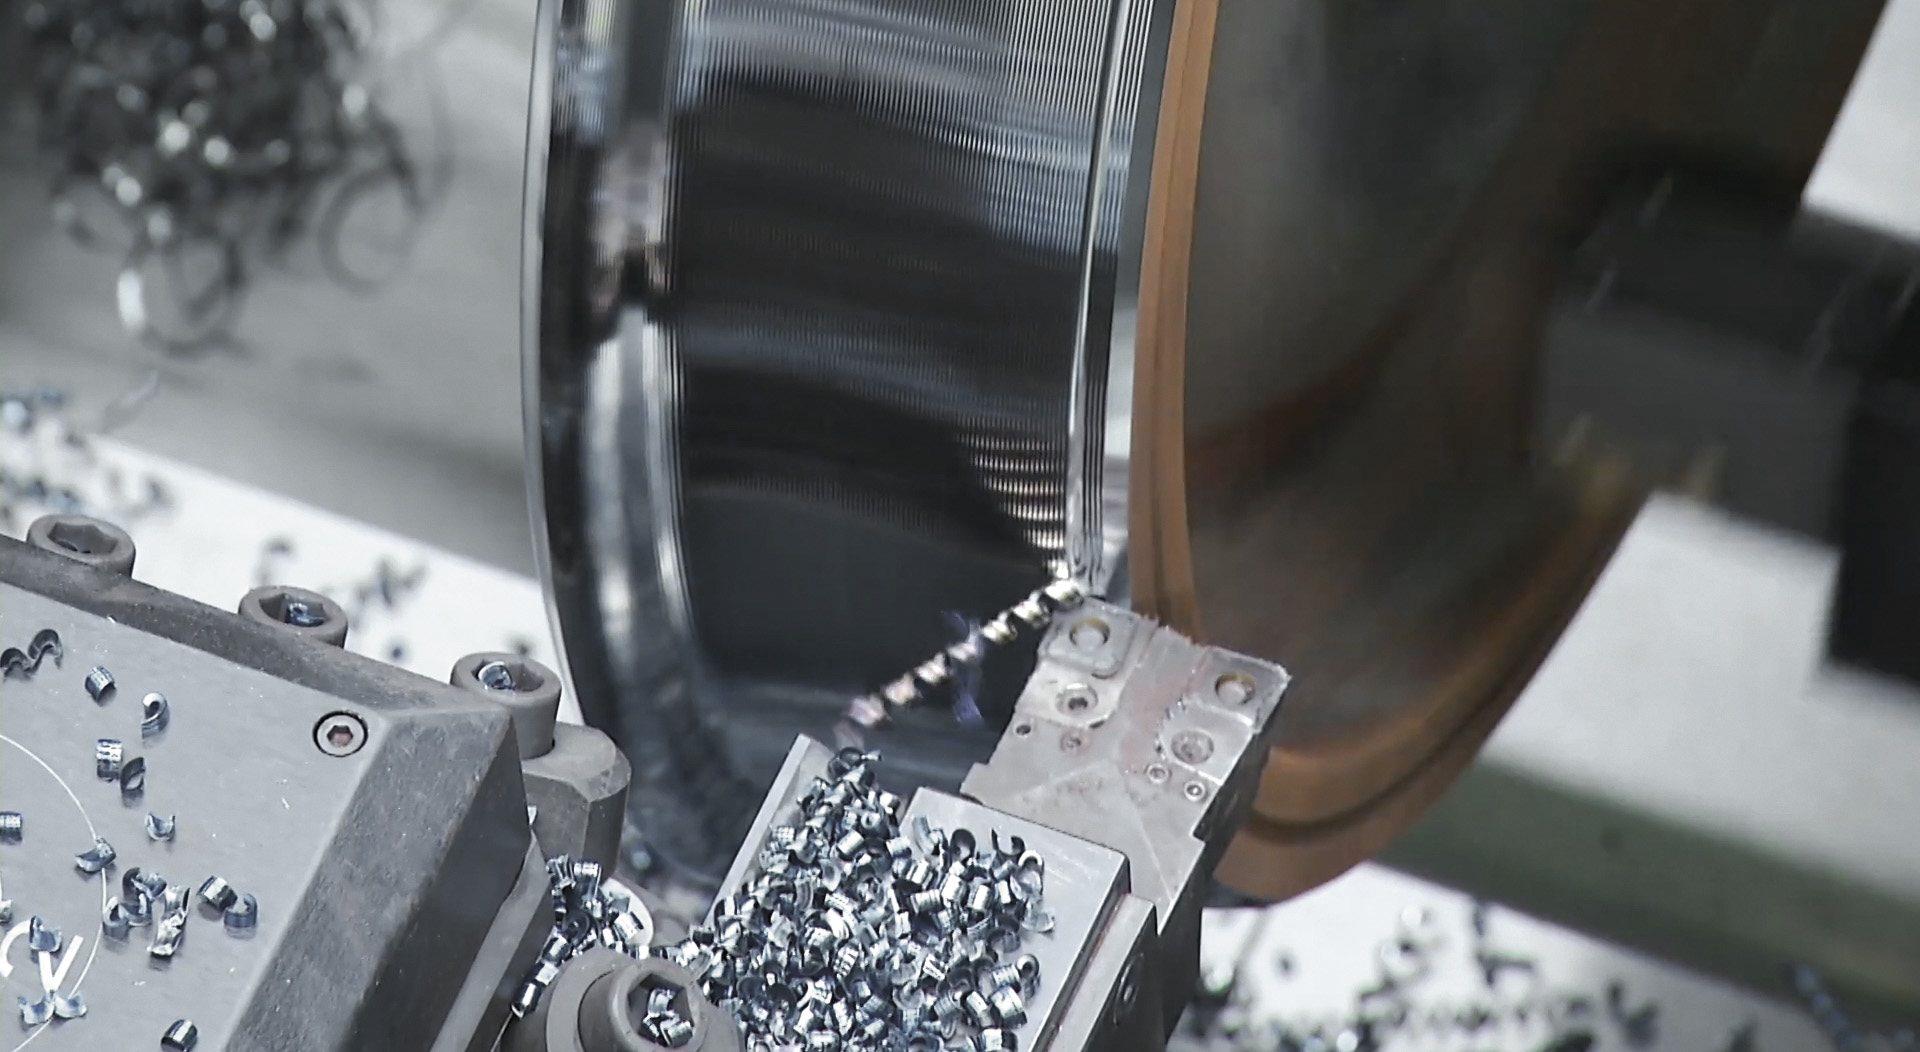 Galería tornos horizontales - foto 13 - Máquina Herramienta - Geminis Lathes